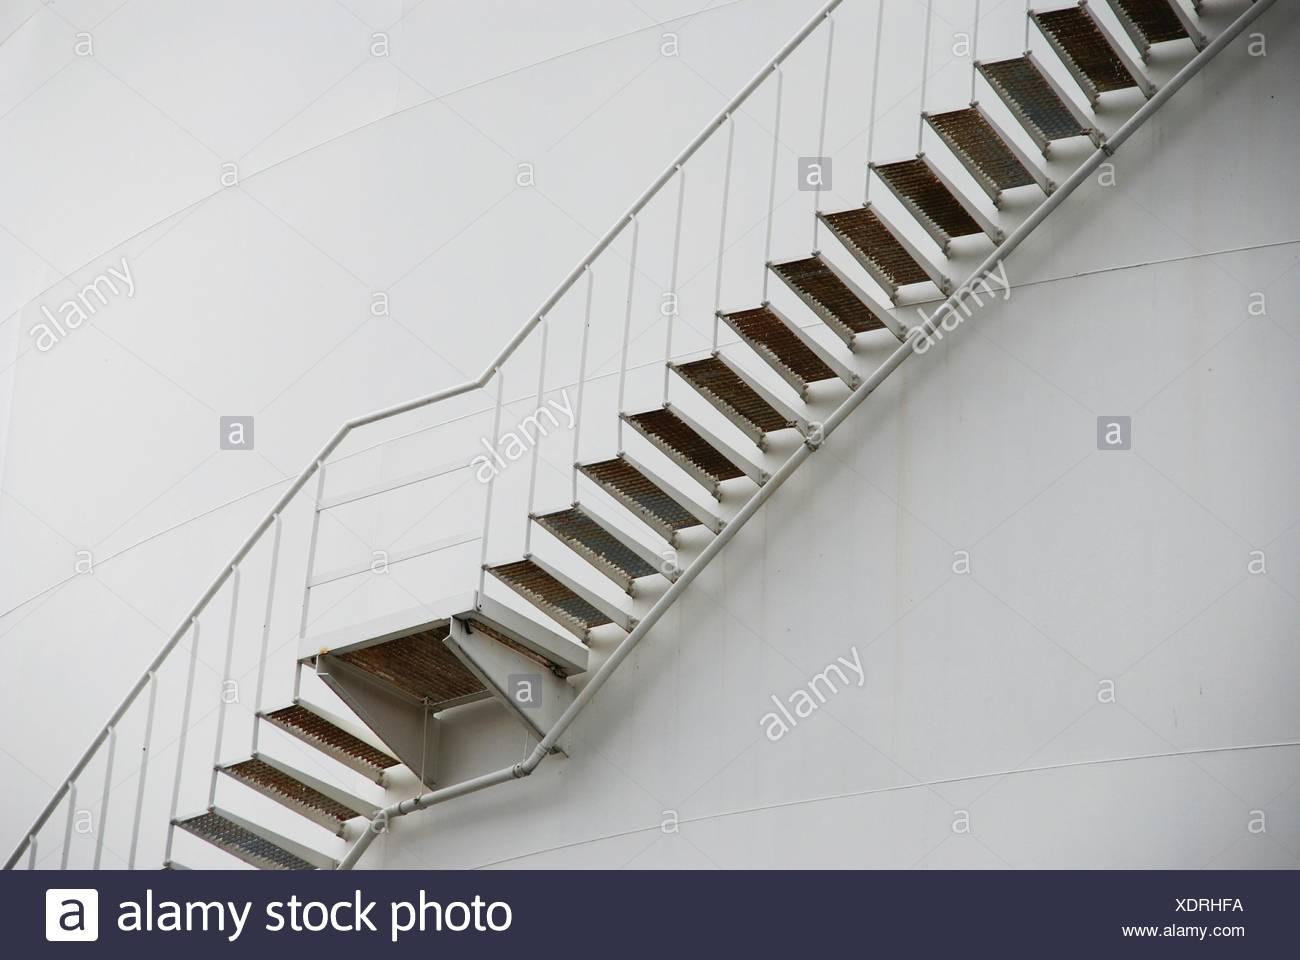 Niedrigen Winkel Ansicht der Treppe an der Wand Stockbild